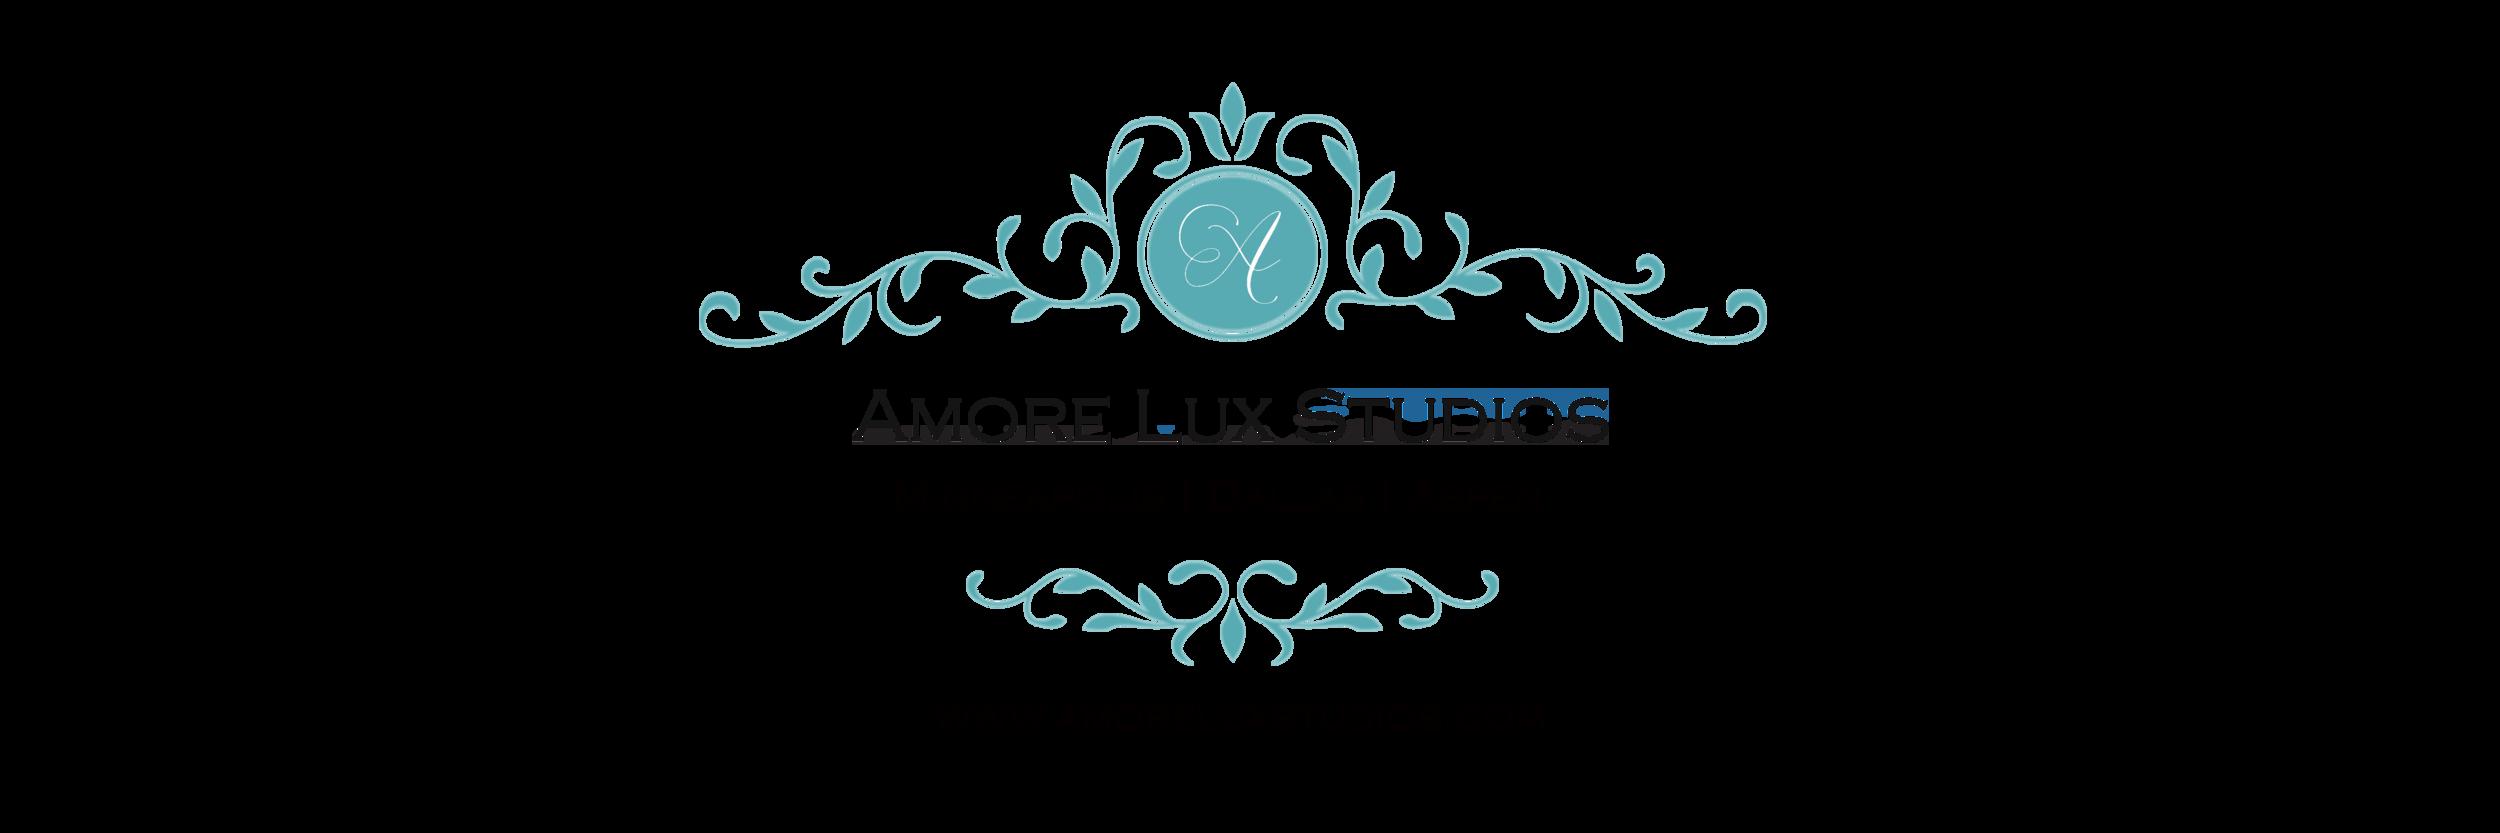 Amore 2018 Logo.png